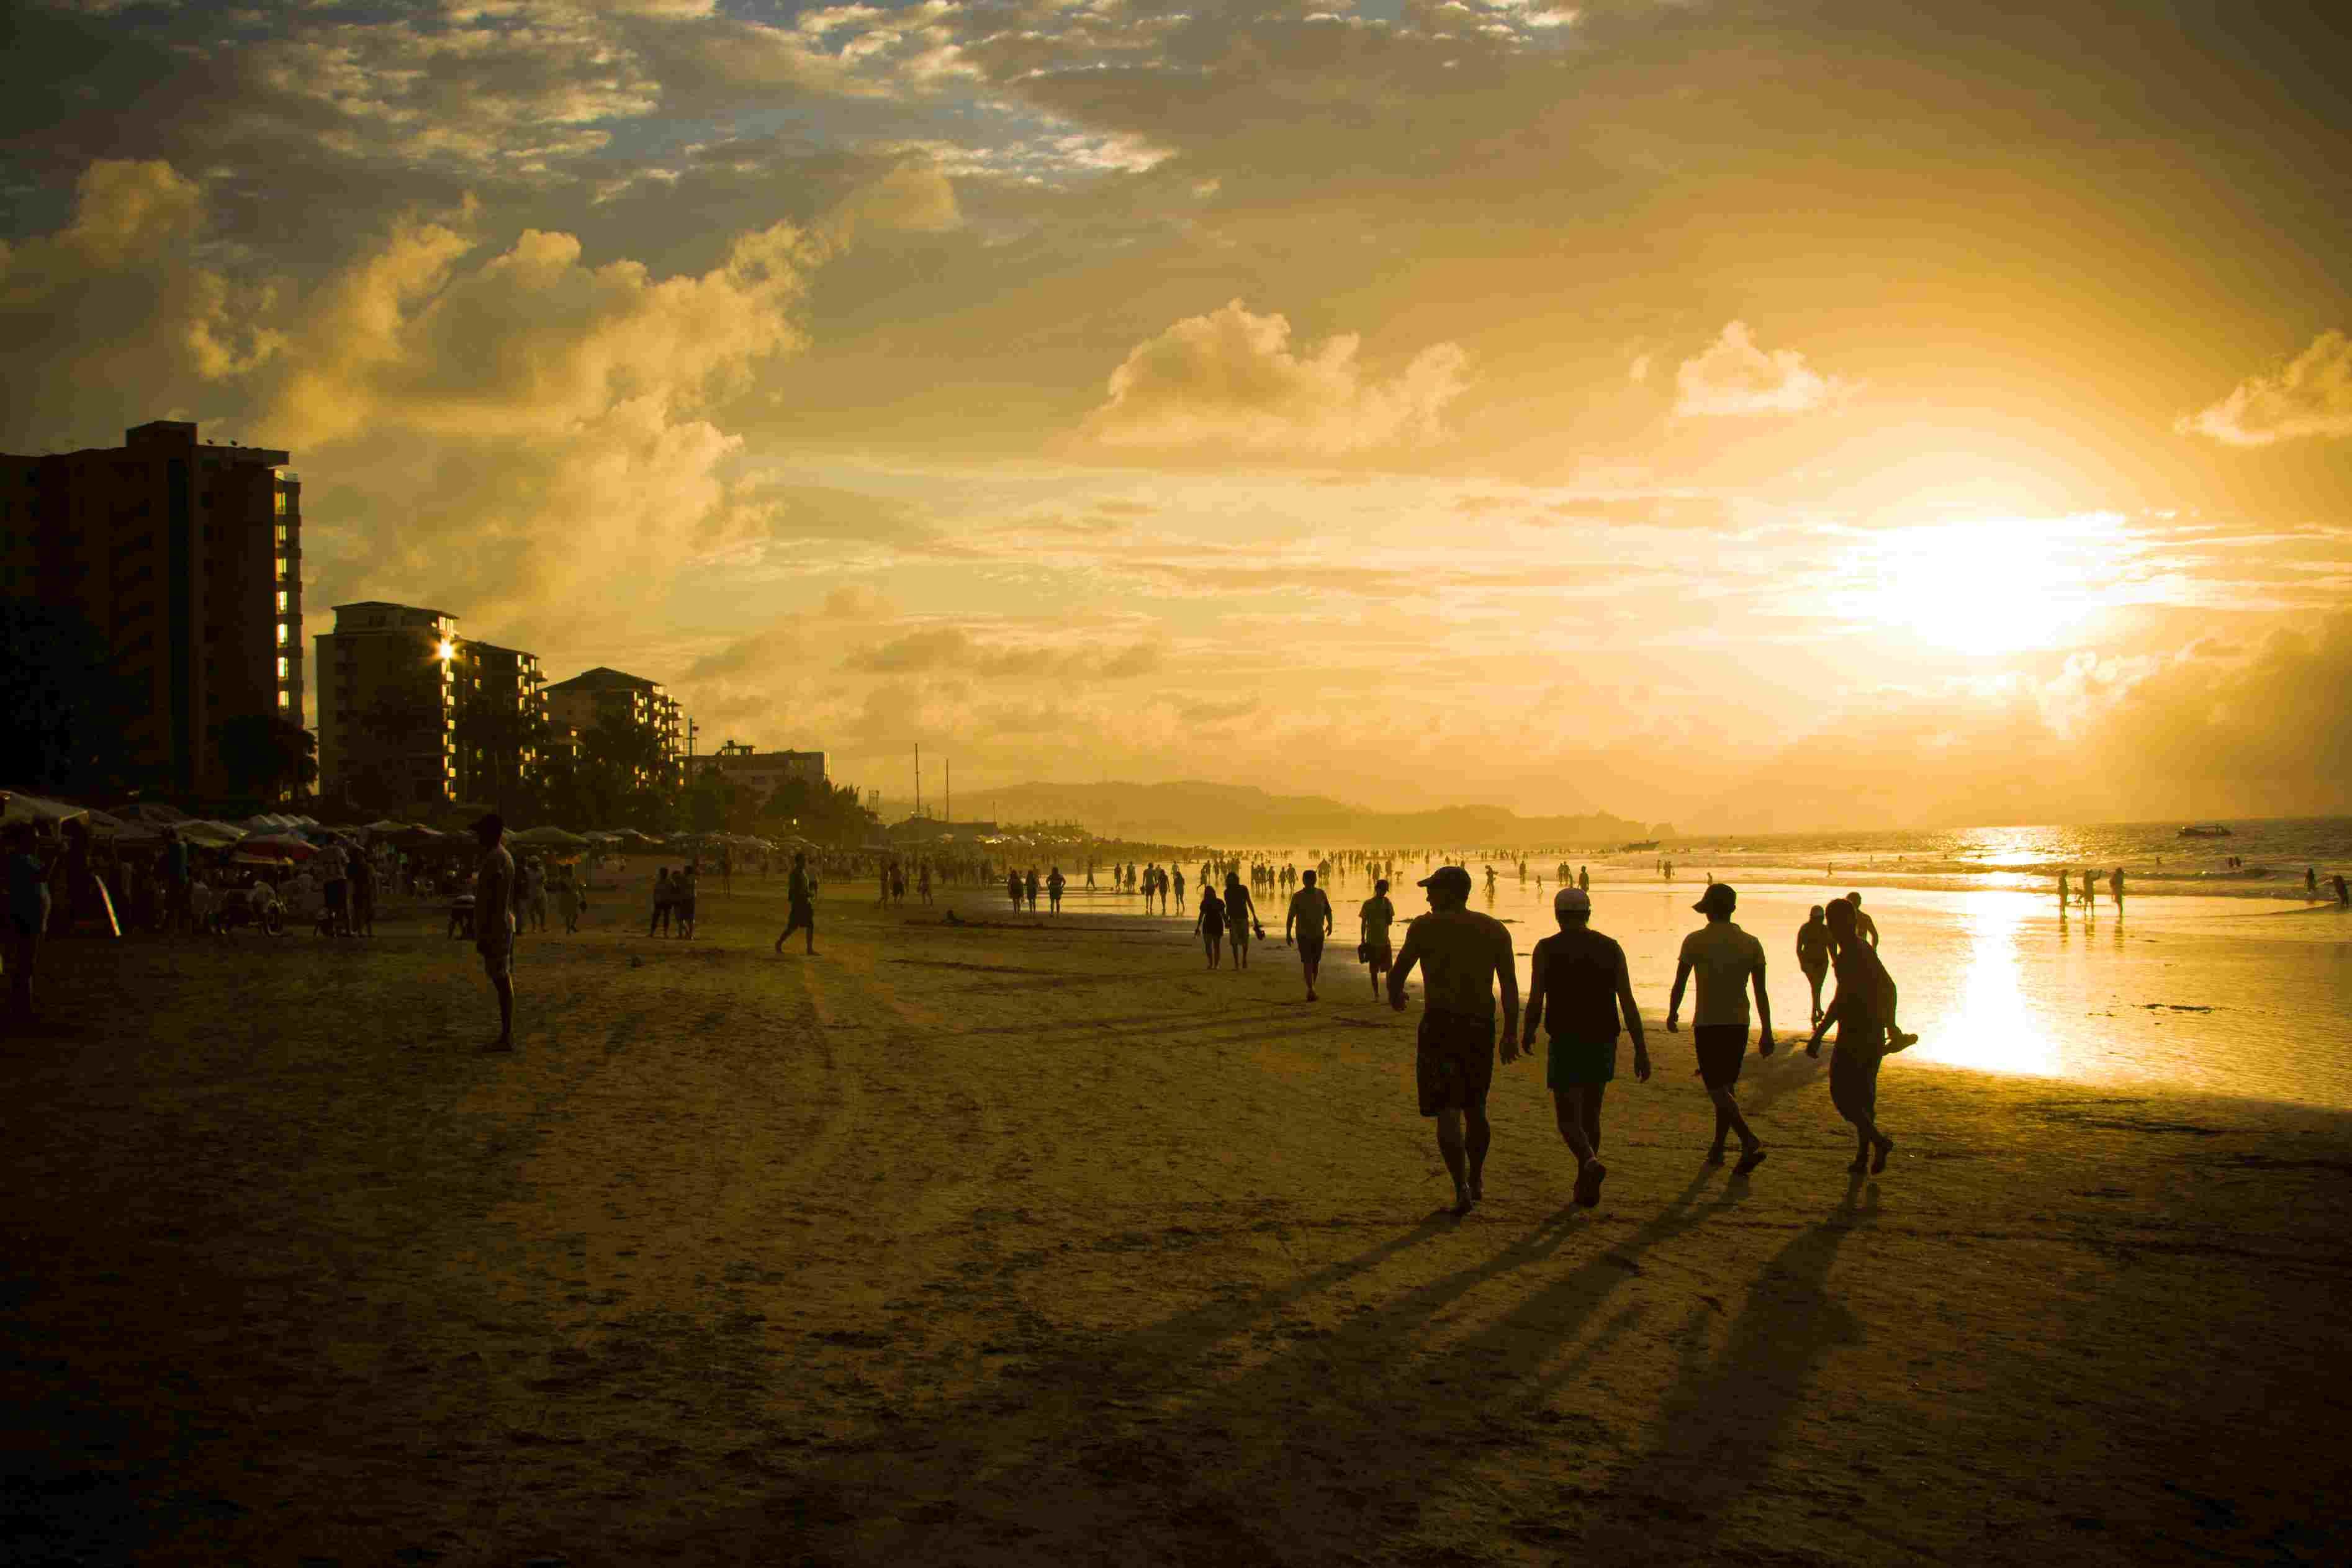 People walking along Tonsupa Beach in Esmeraldas, Ecuador